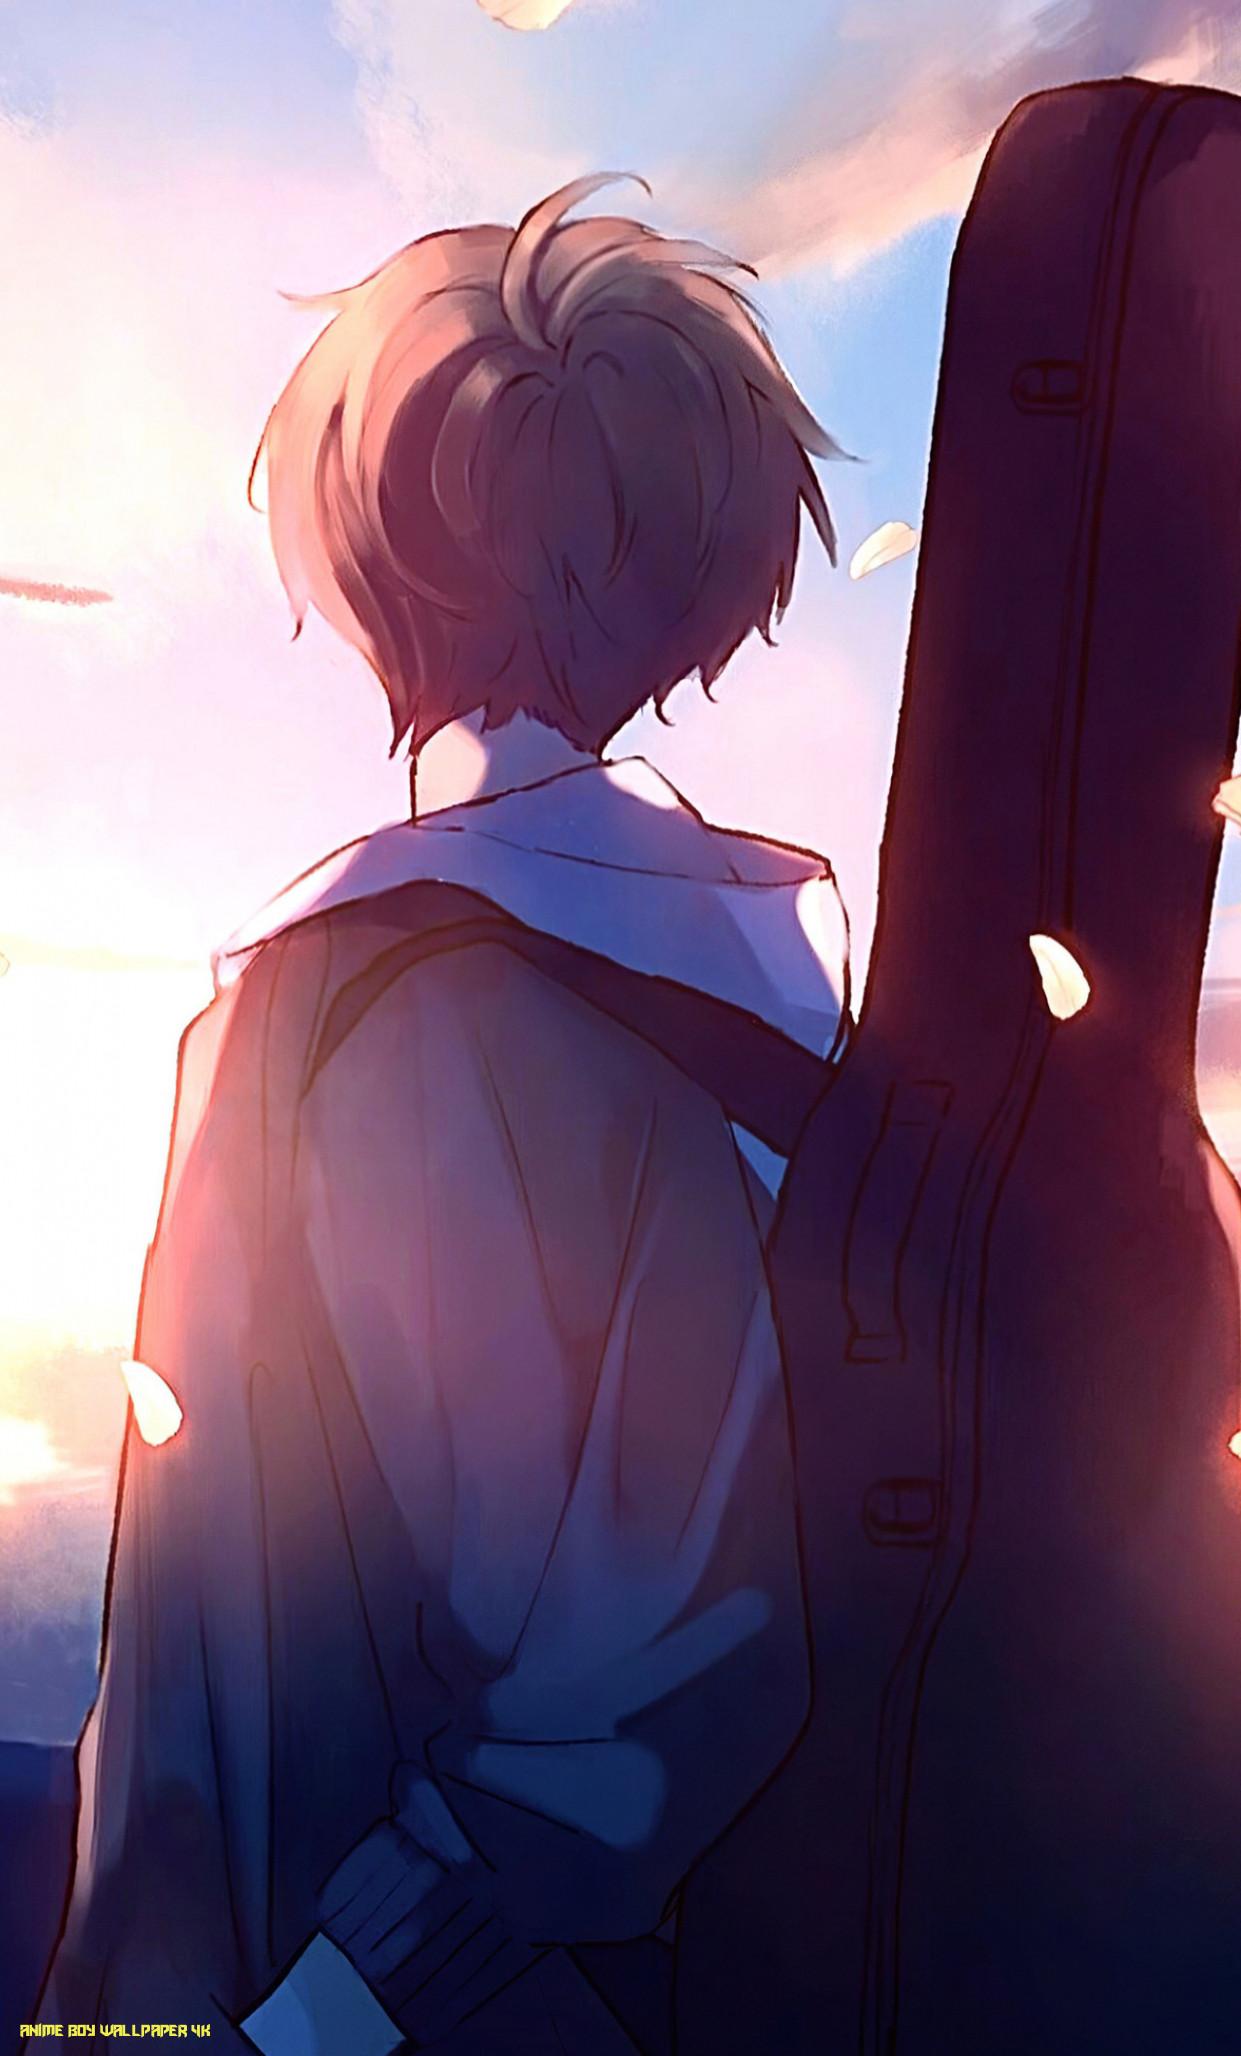 Anime Boy Wallpaper 14k Phone Anime Boy Guitar 1241x2056 Download Hd Wallpaper Wallpapertip